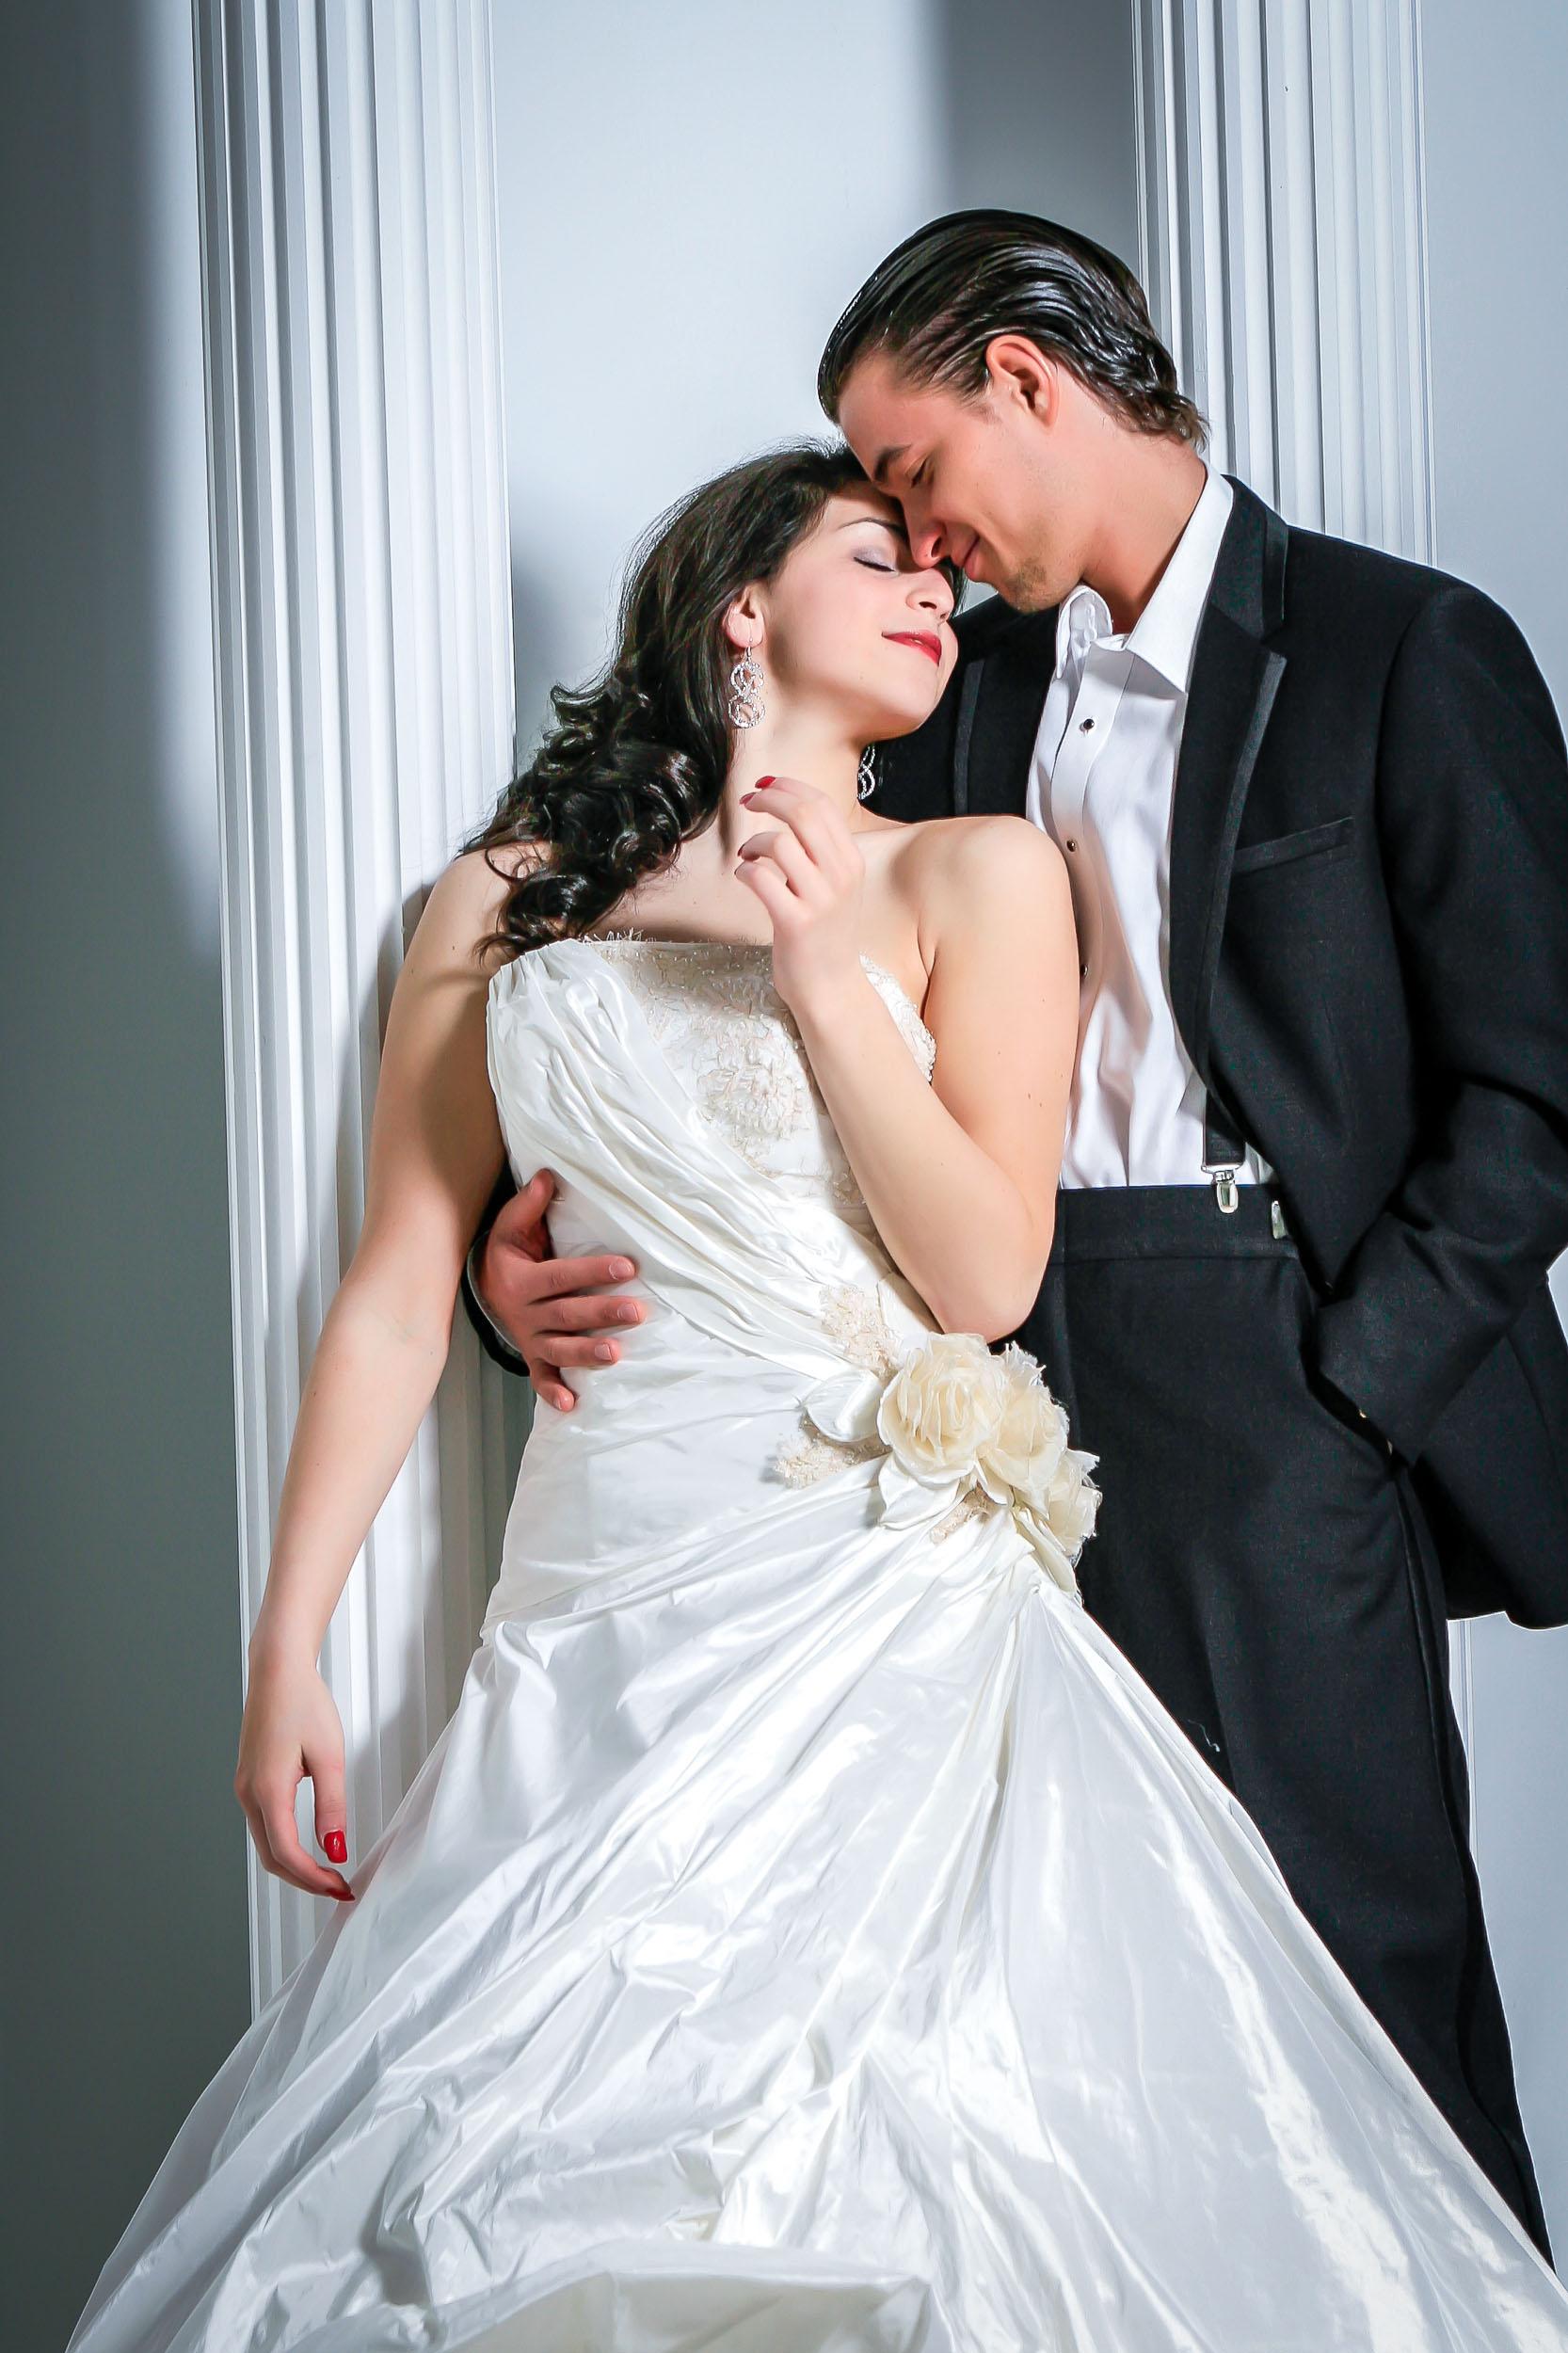 Wedding_Photography_Photo_Studio_Newmarket-21.jpg